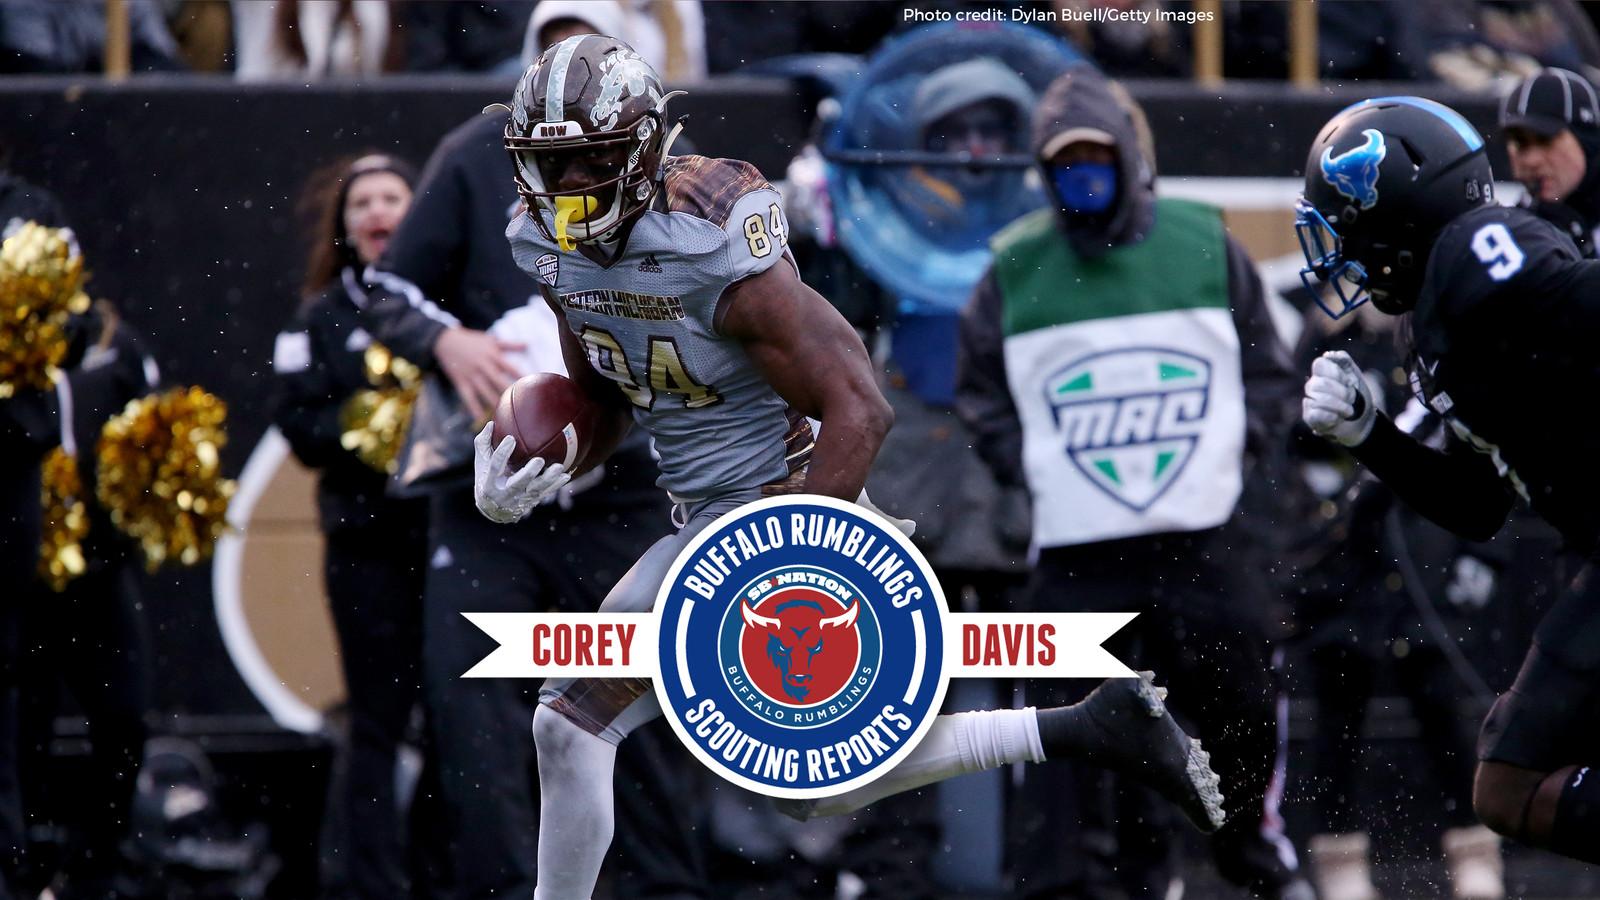 Corey Davis 2017 NFL Draft scouting report